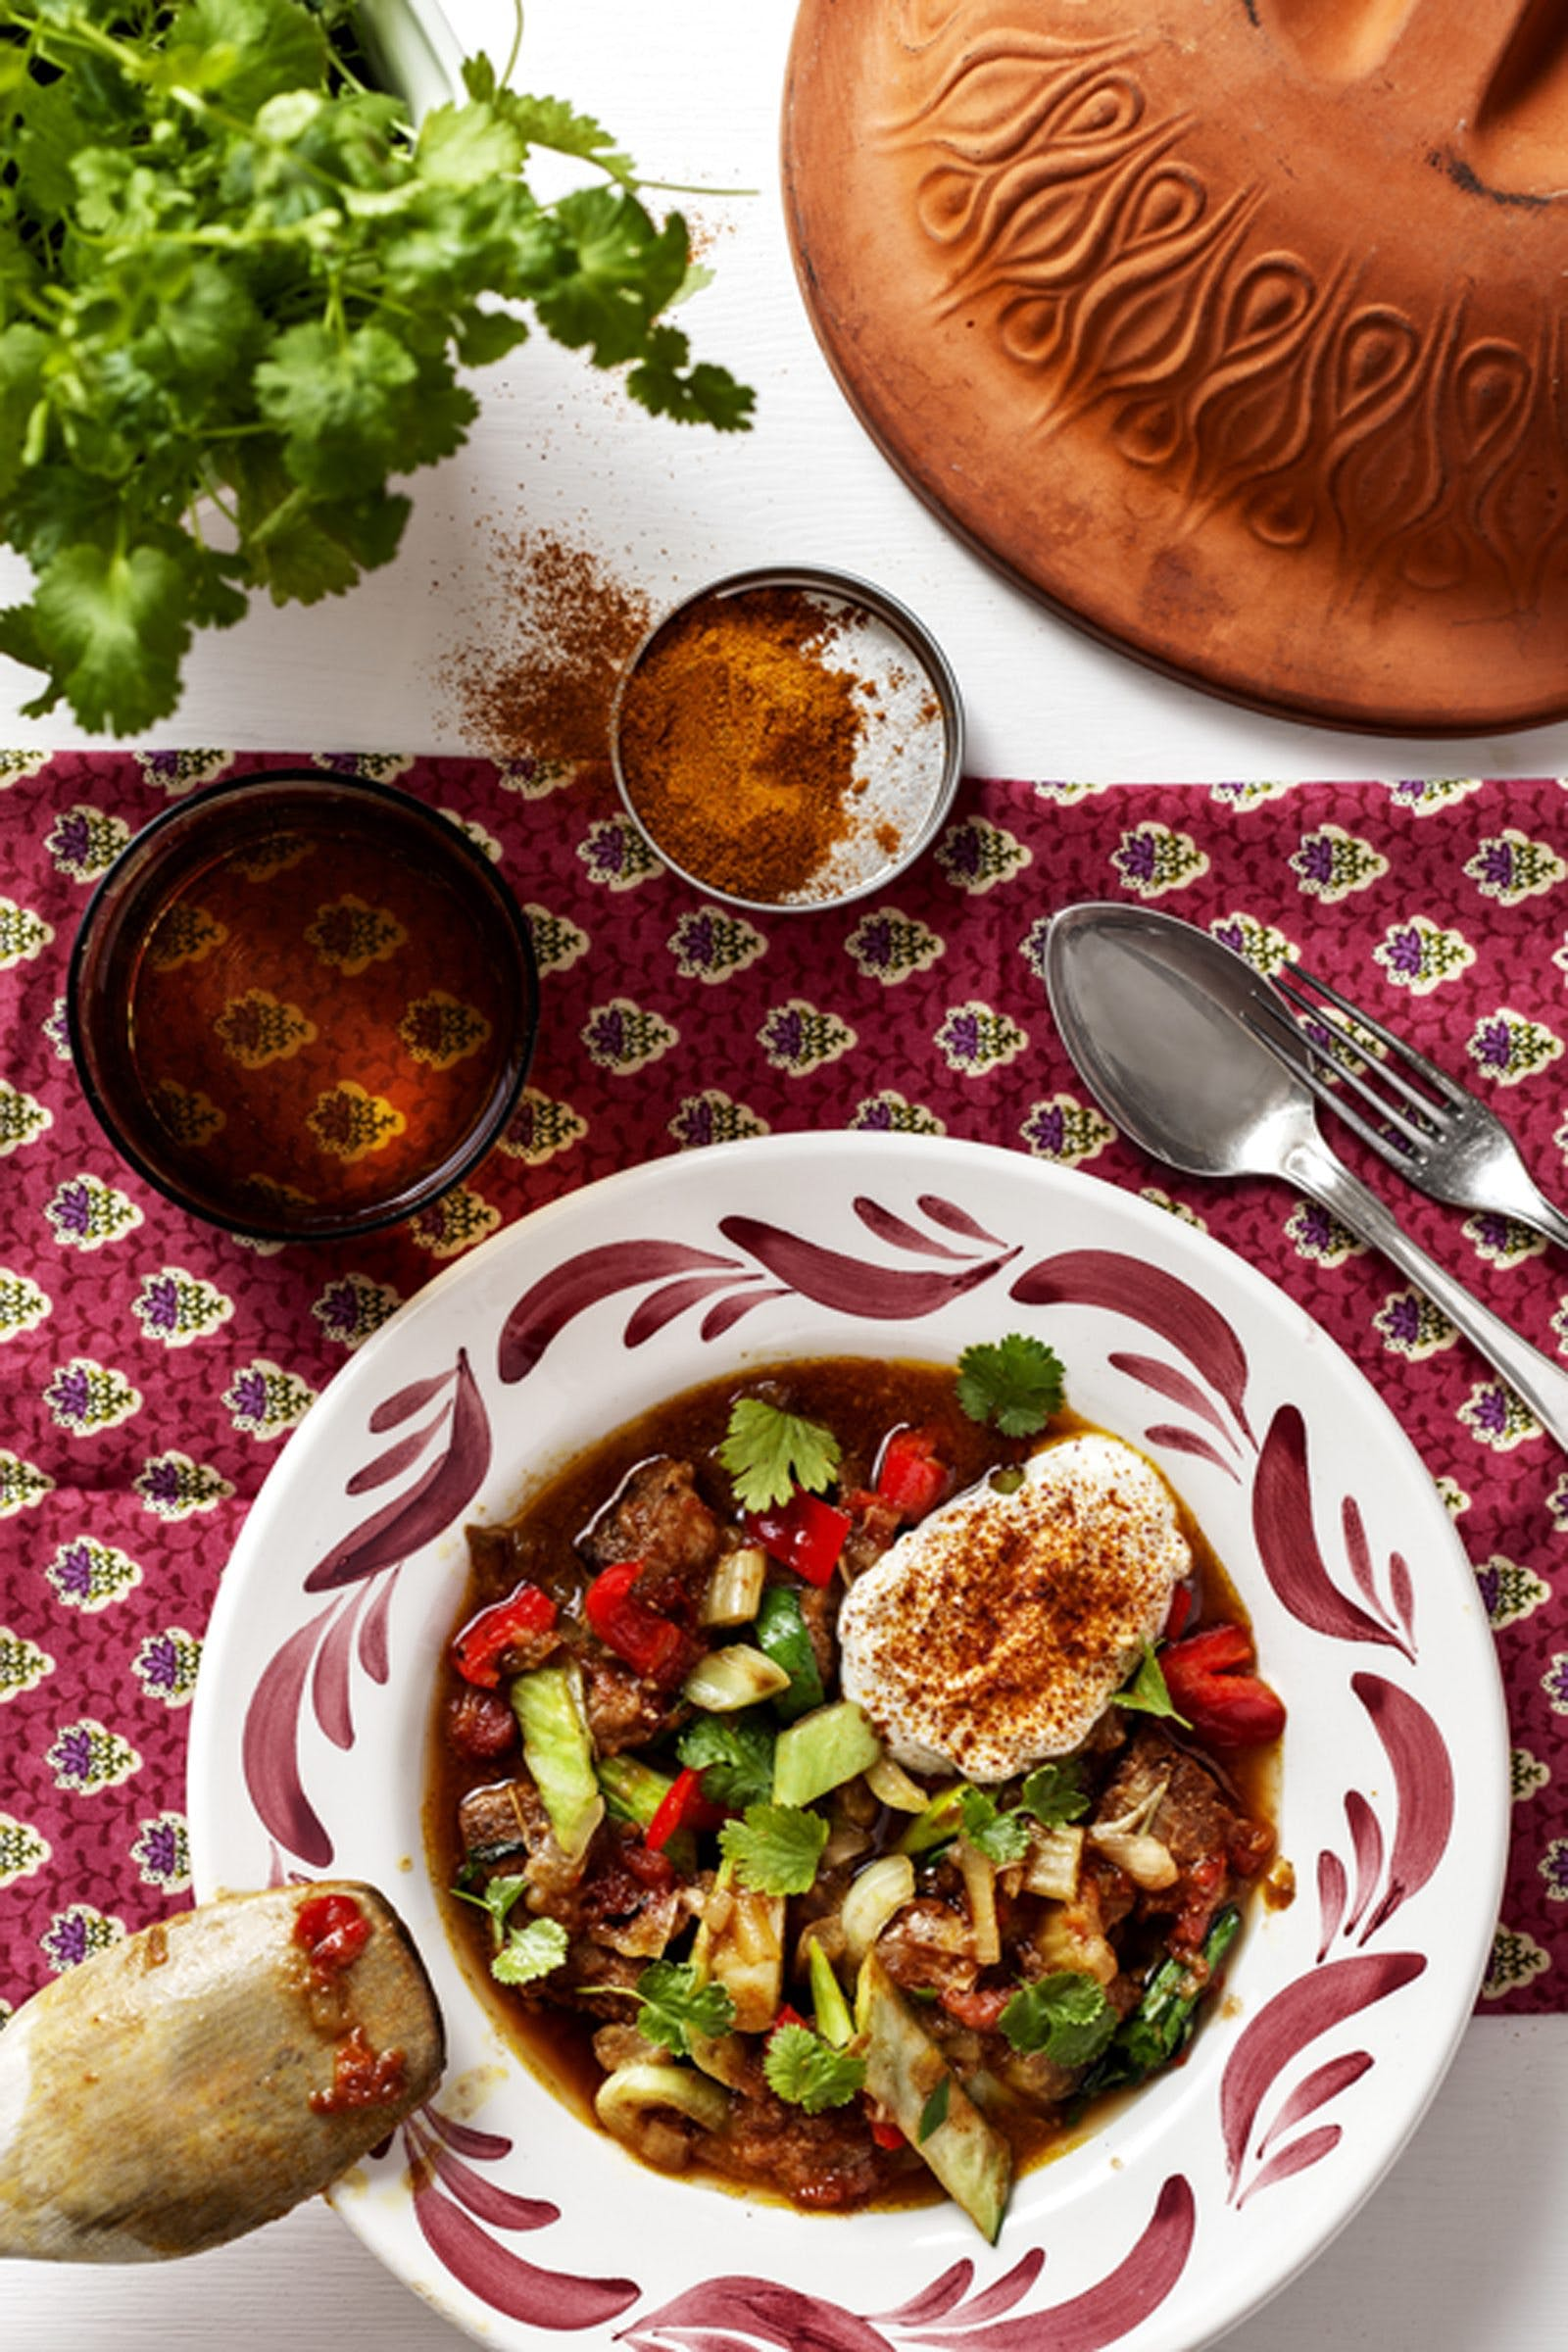 Perfekt slow food: Indisk lergryta